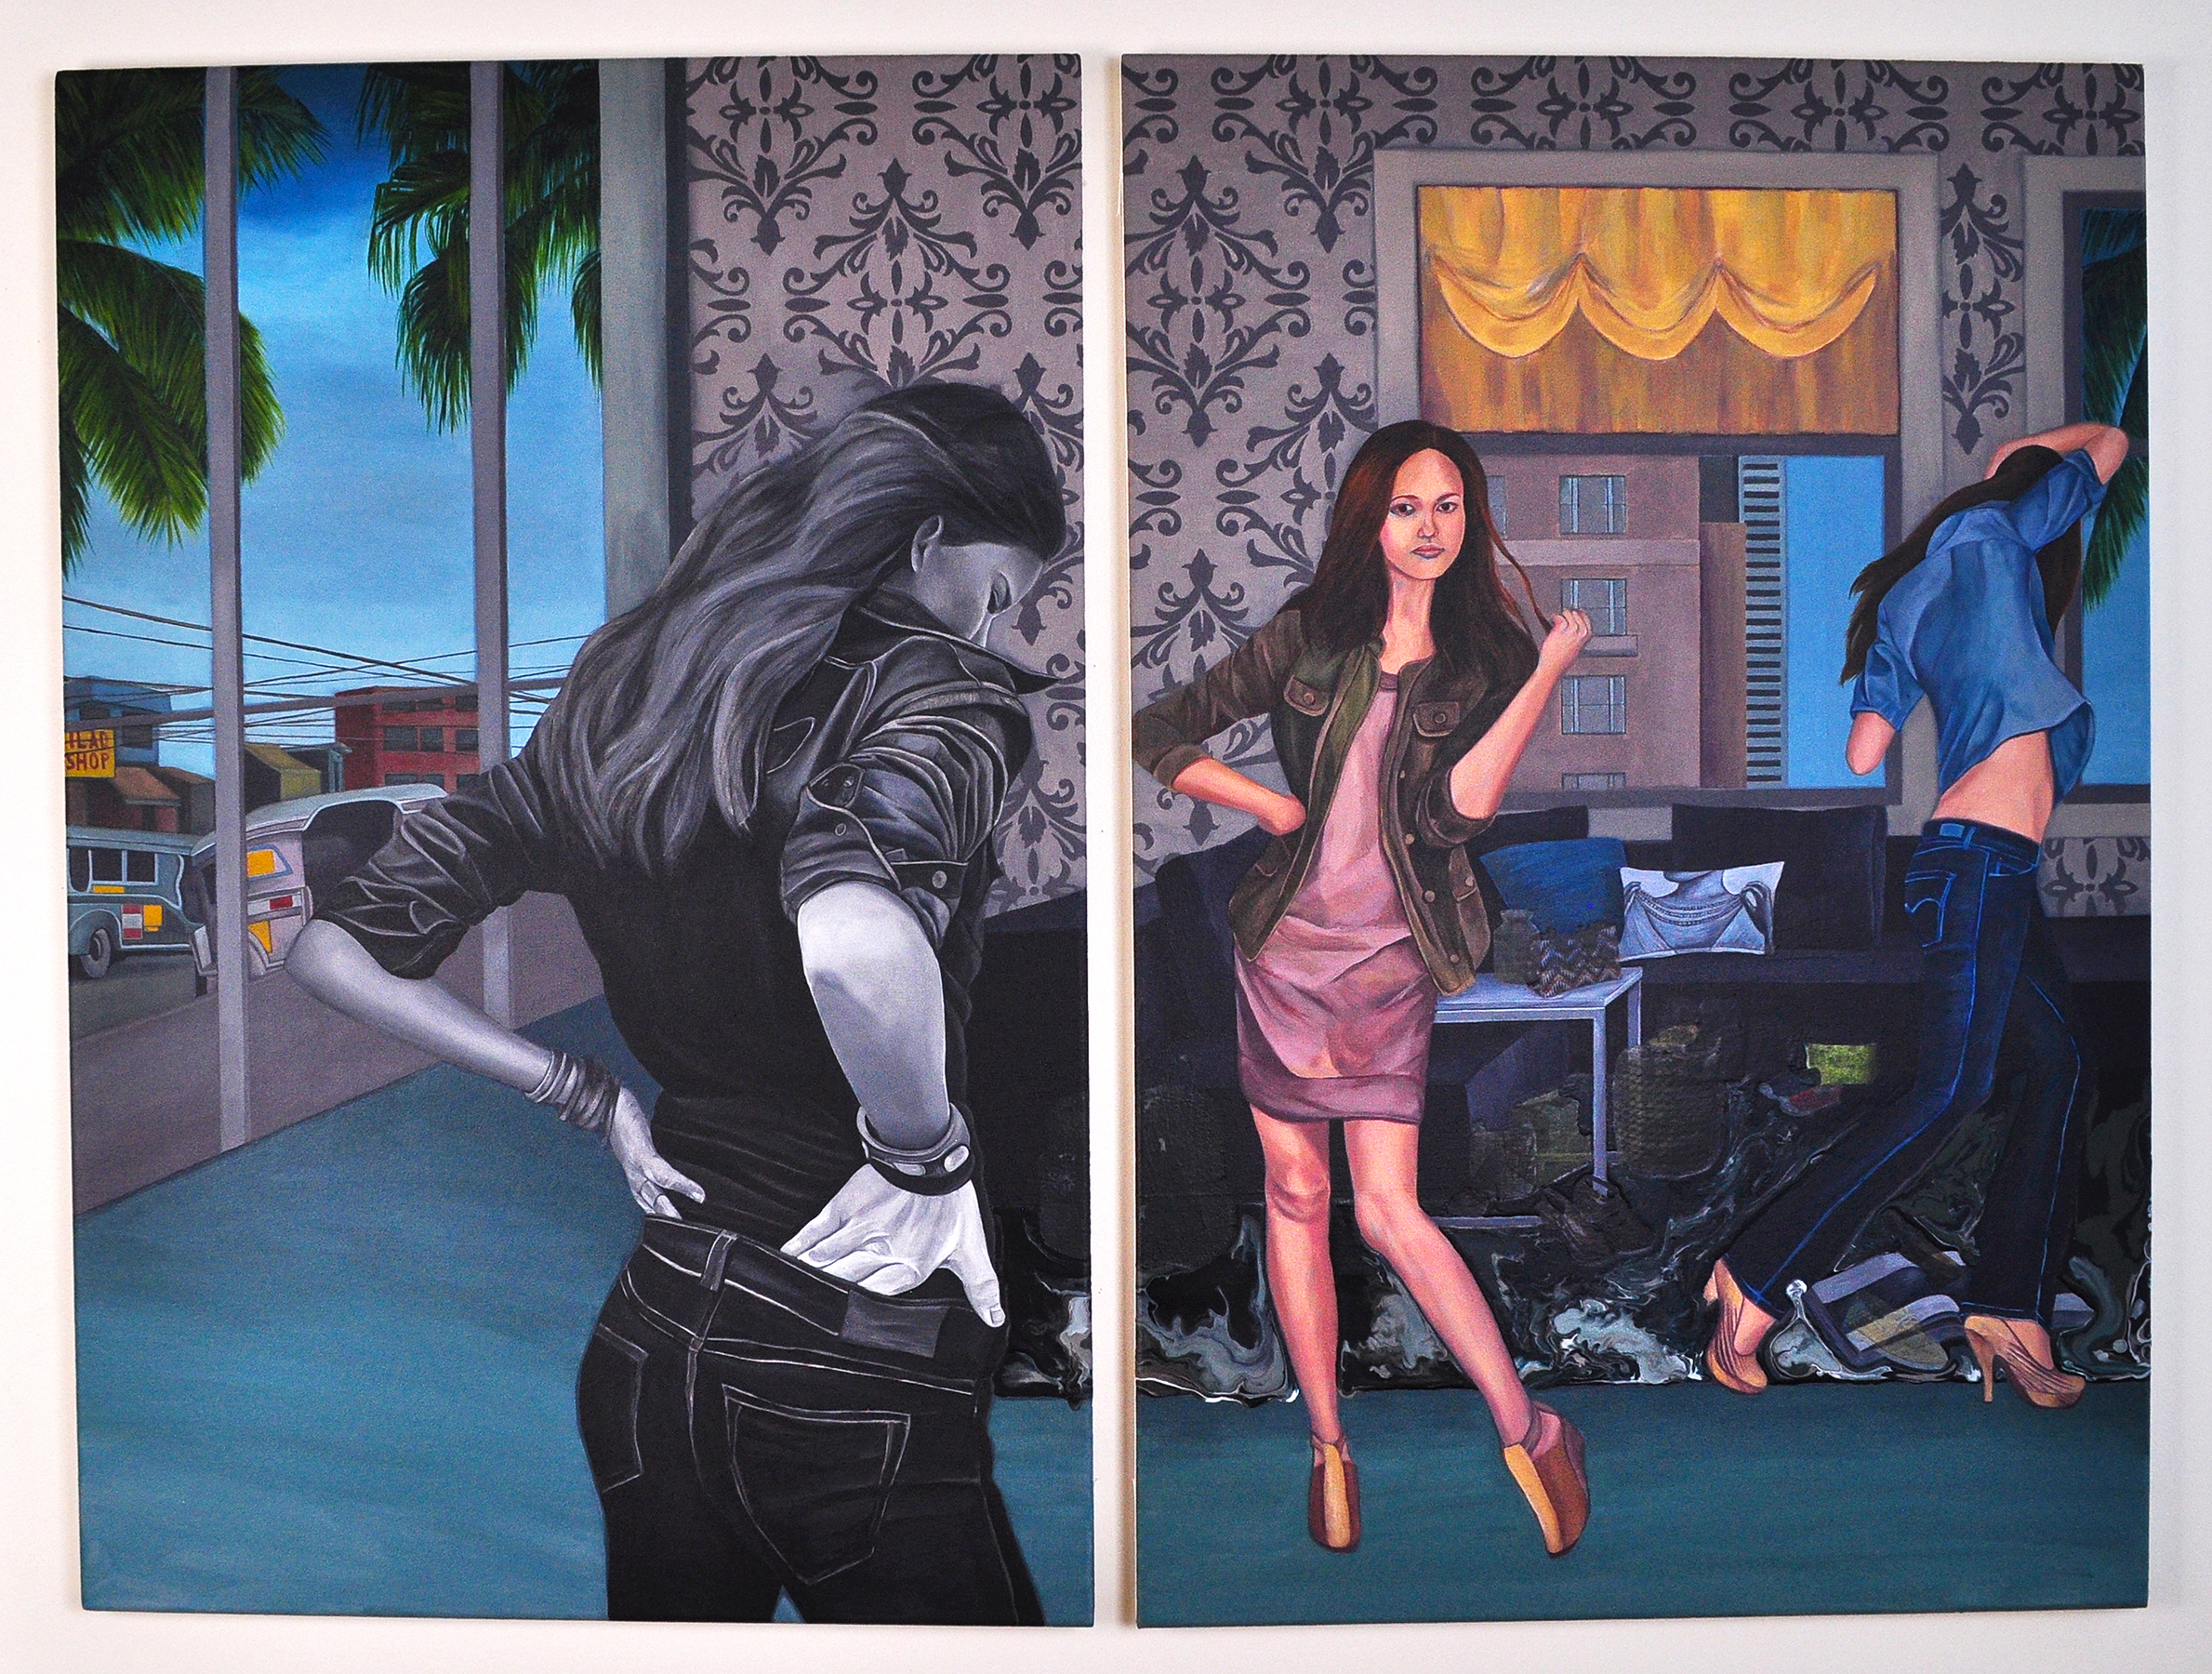 "Inside Out , 2011.Acrylic & image transfer on canvas, 38"" x 50"" overall (Photo: Ramon Pintado)"